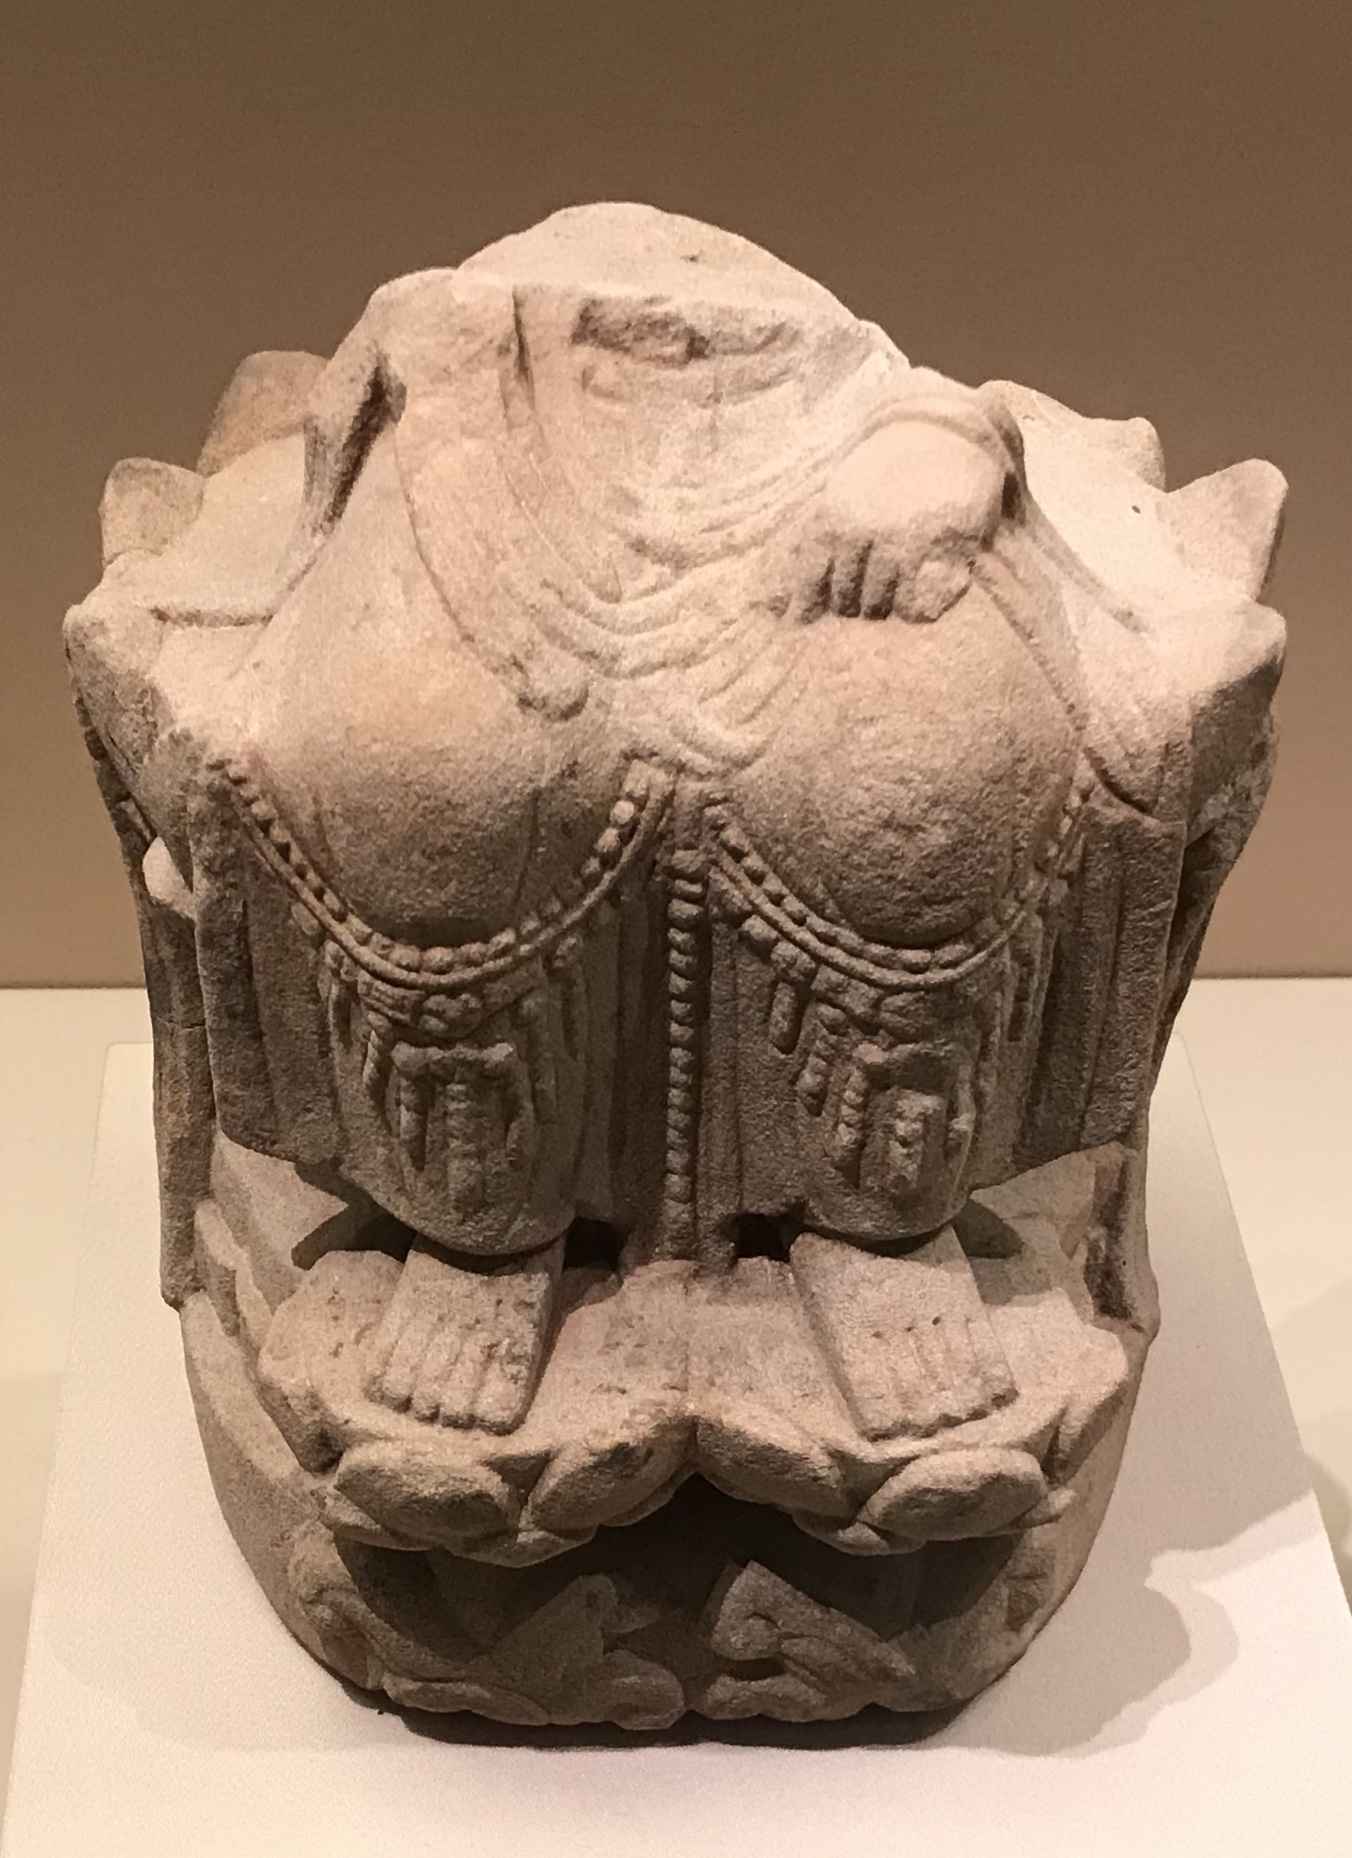 菩薩残像-五代-天下の大足-大足石刻の発見と継承-金沙遺跡博物館-成都